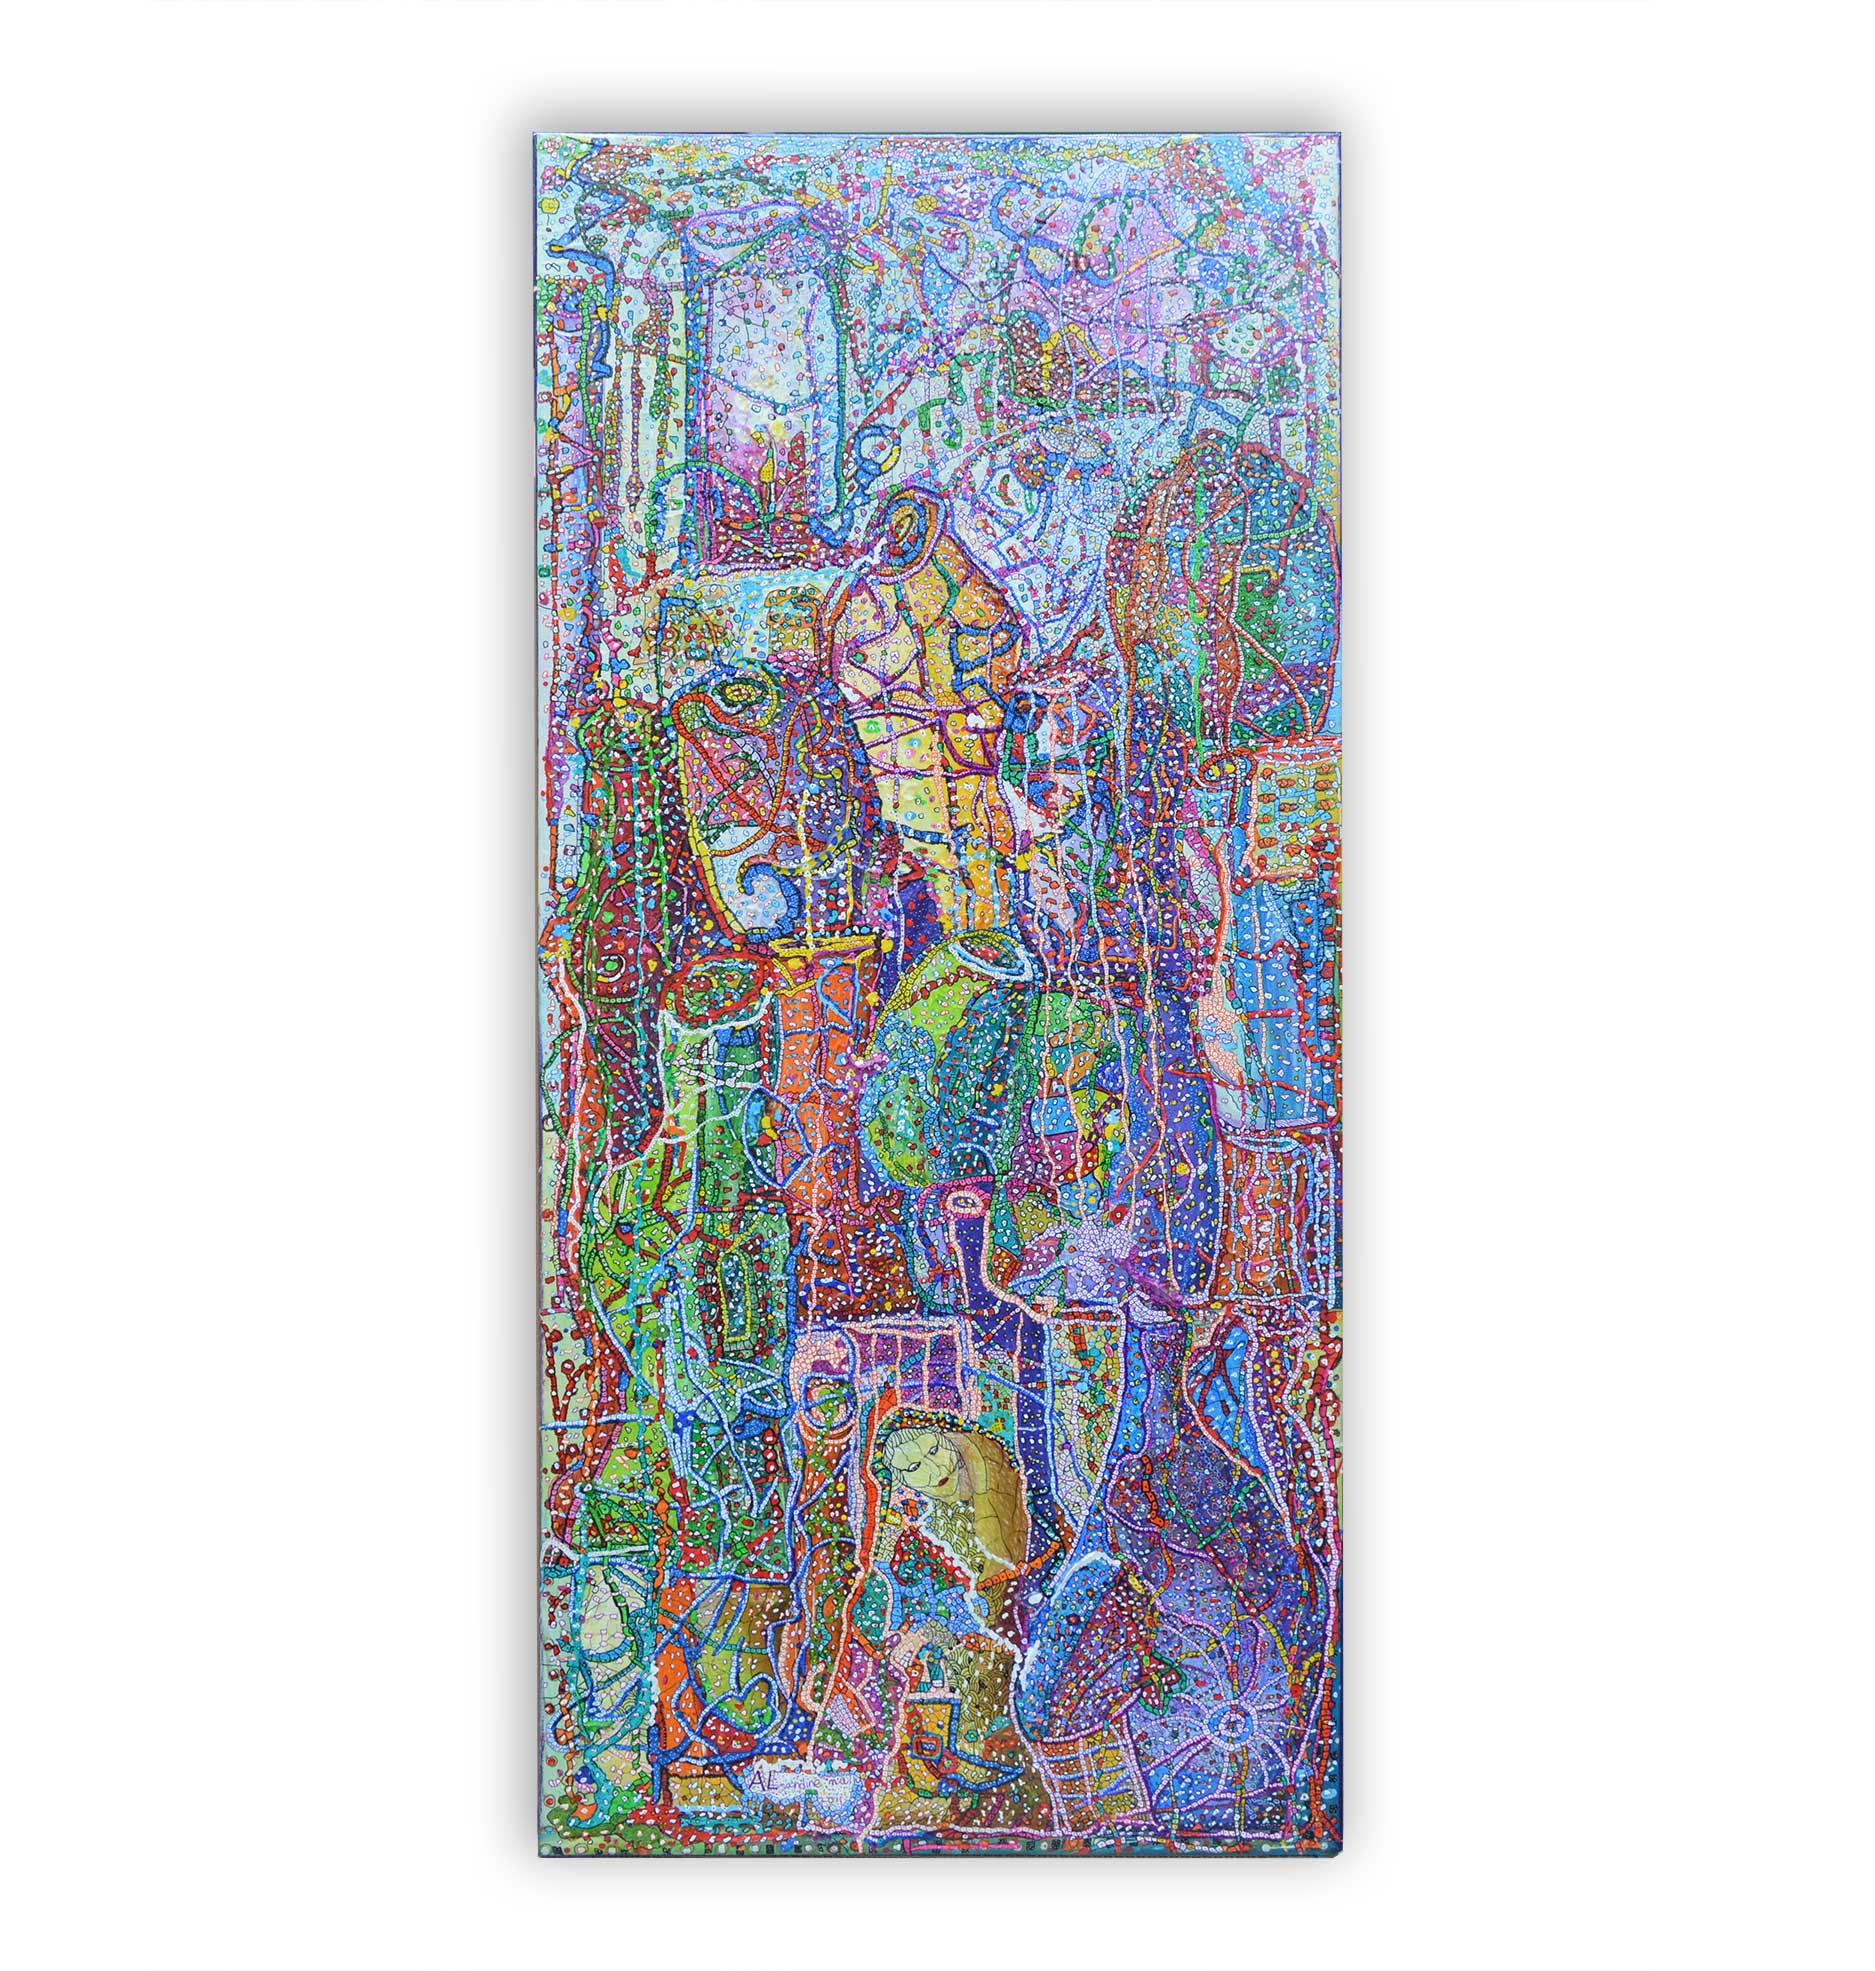 Crescendo by Mally-Elbaz-Almandine-Painting on canvas